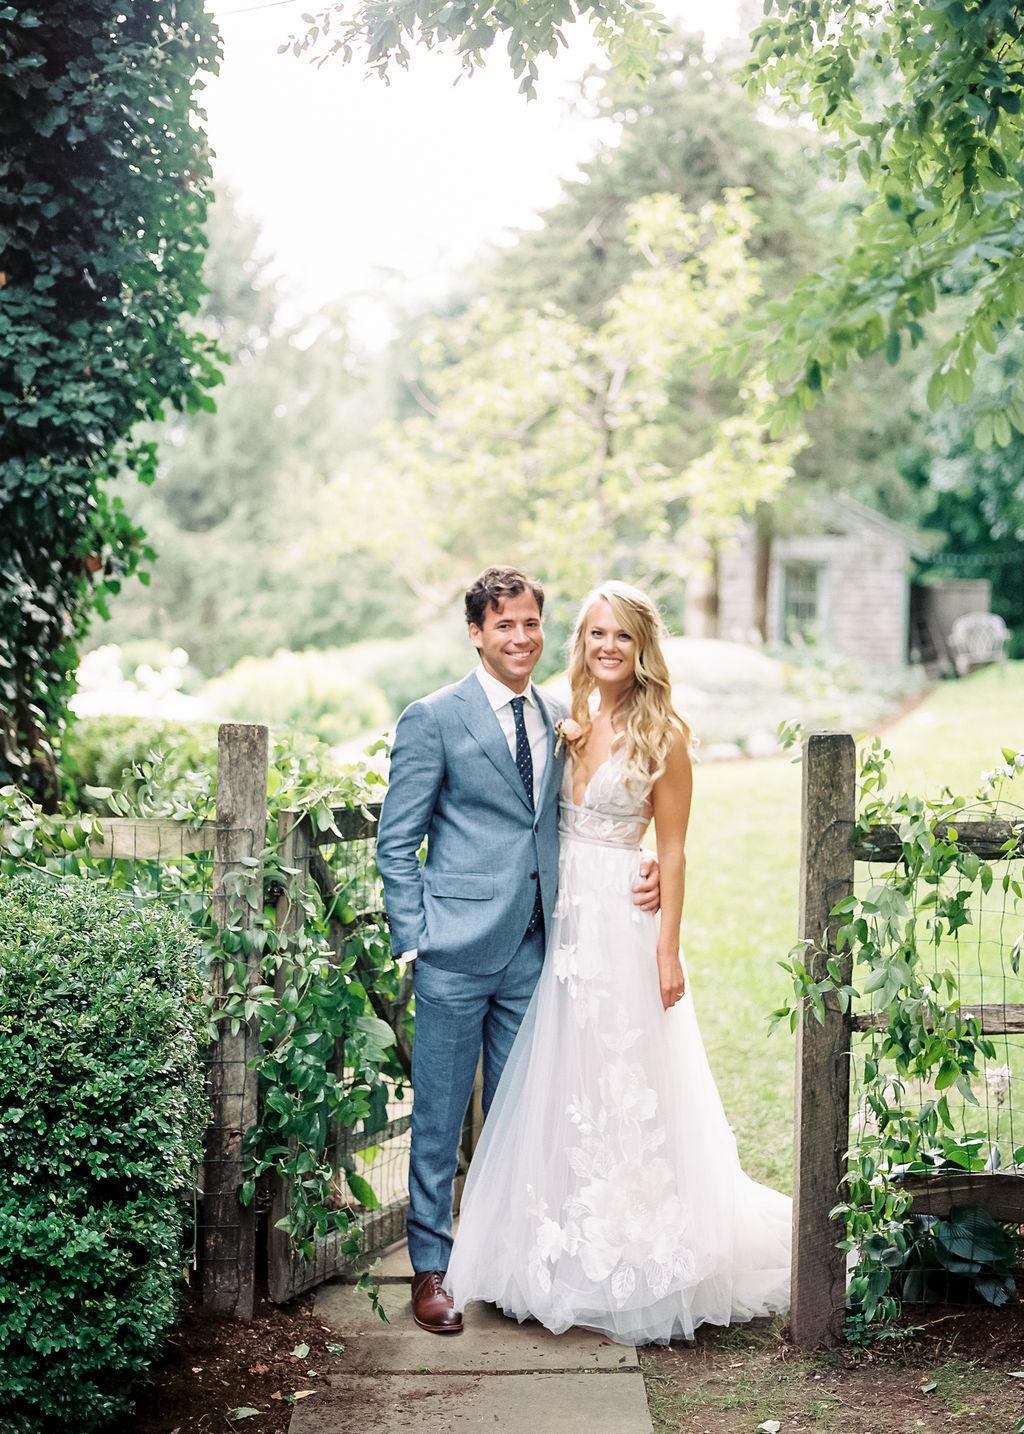 Bedford-NY-Wedding-Planner-Private-Estate21.jpg